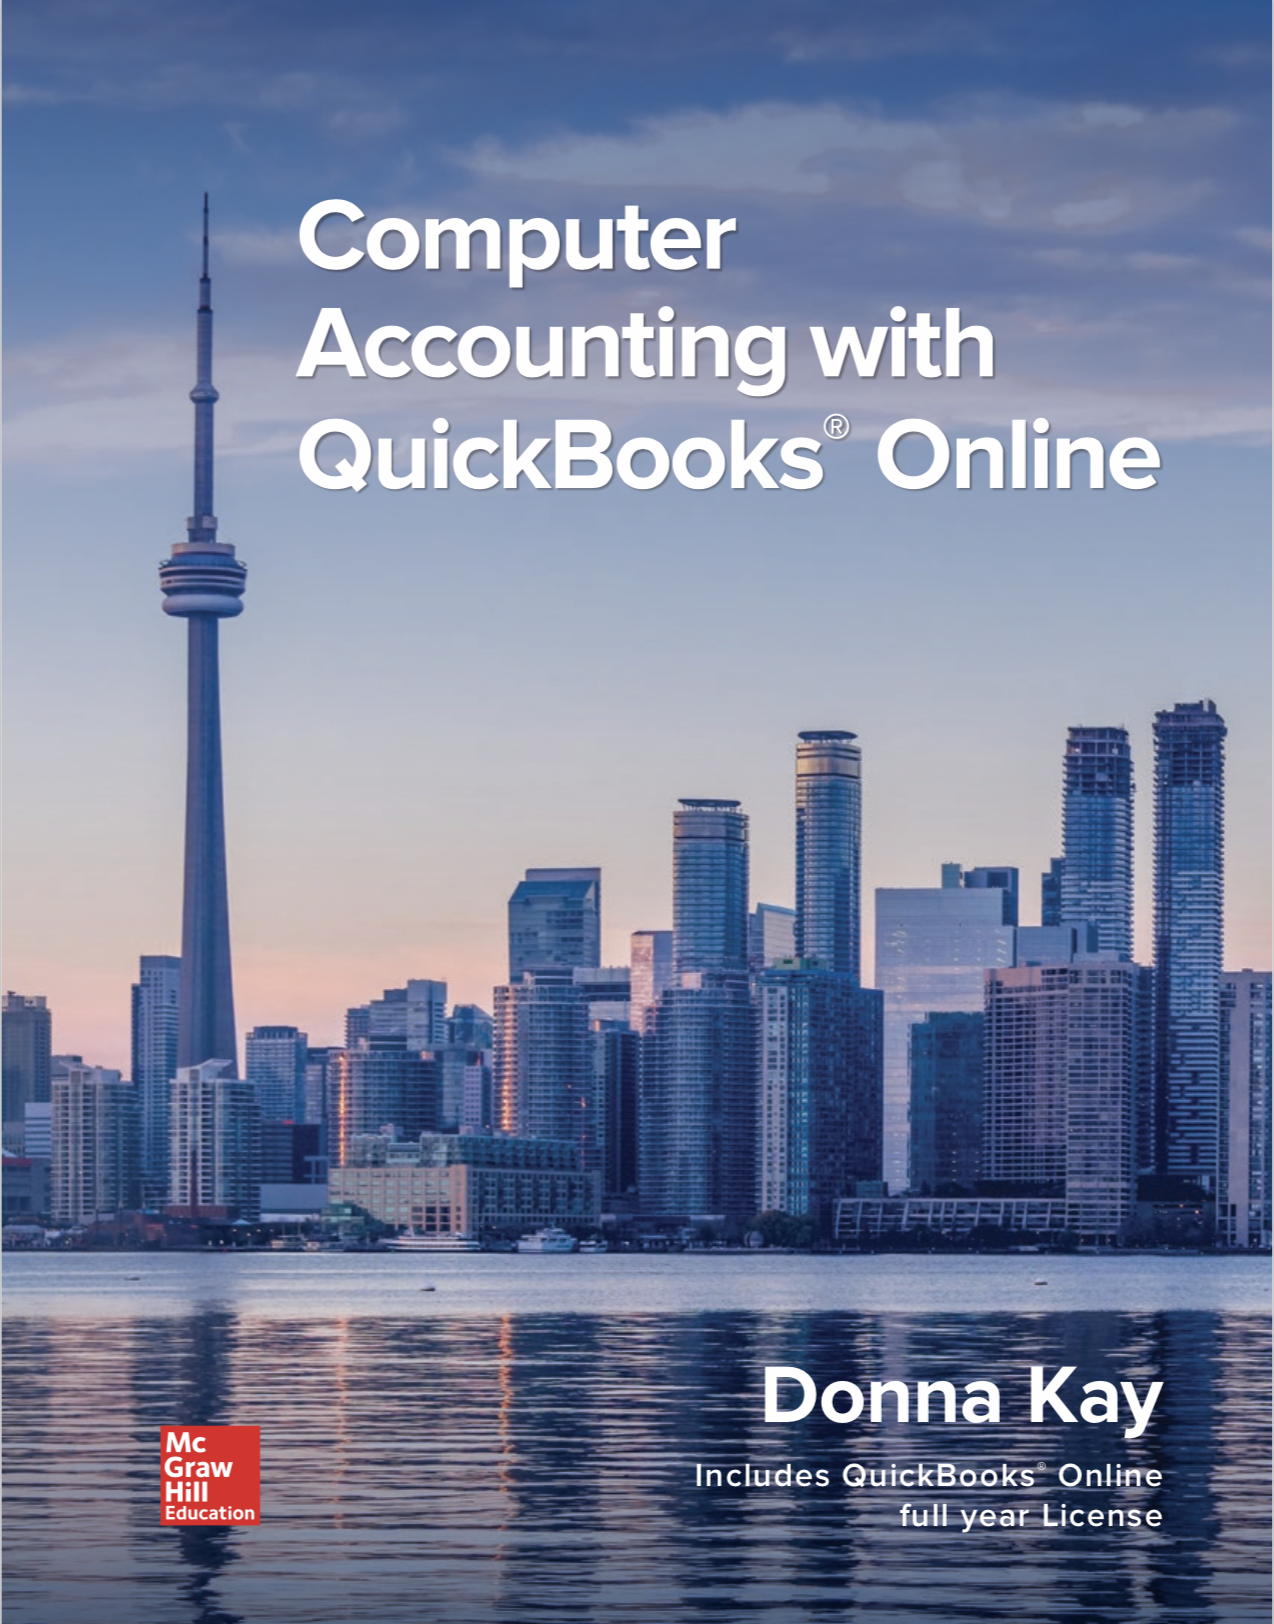 QuickBooks Online QBO — My QBO